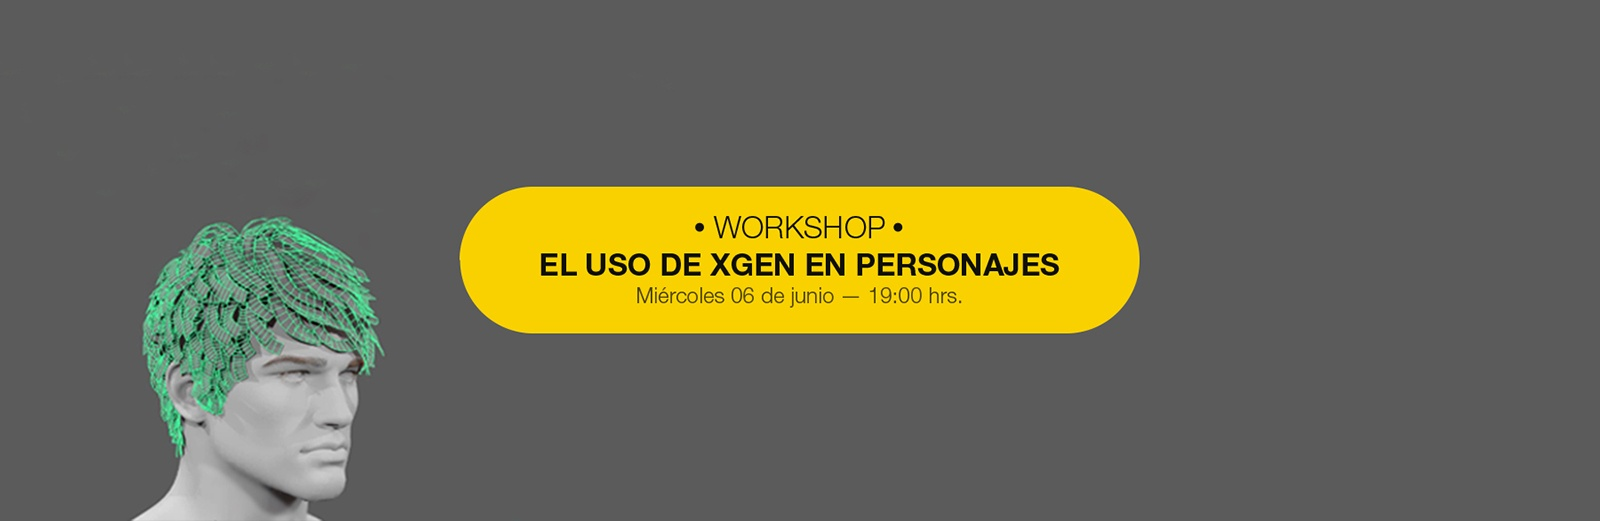 Workshop-XGEN-para-Personajes-web-2